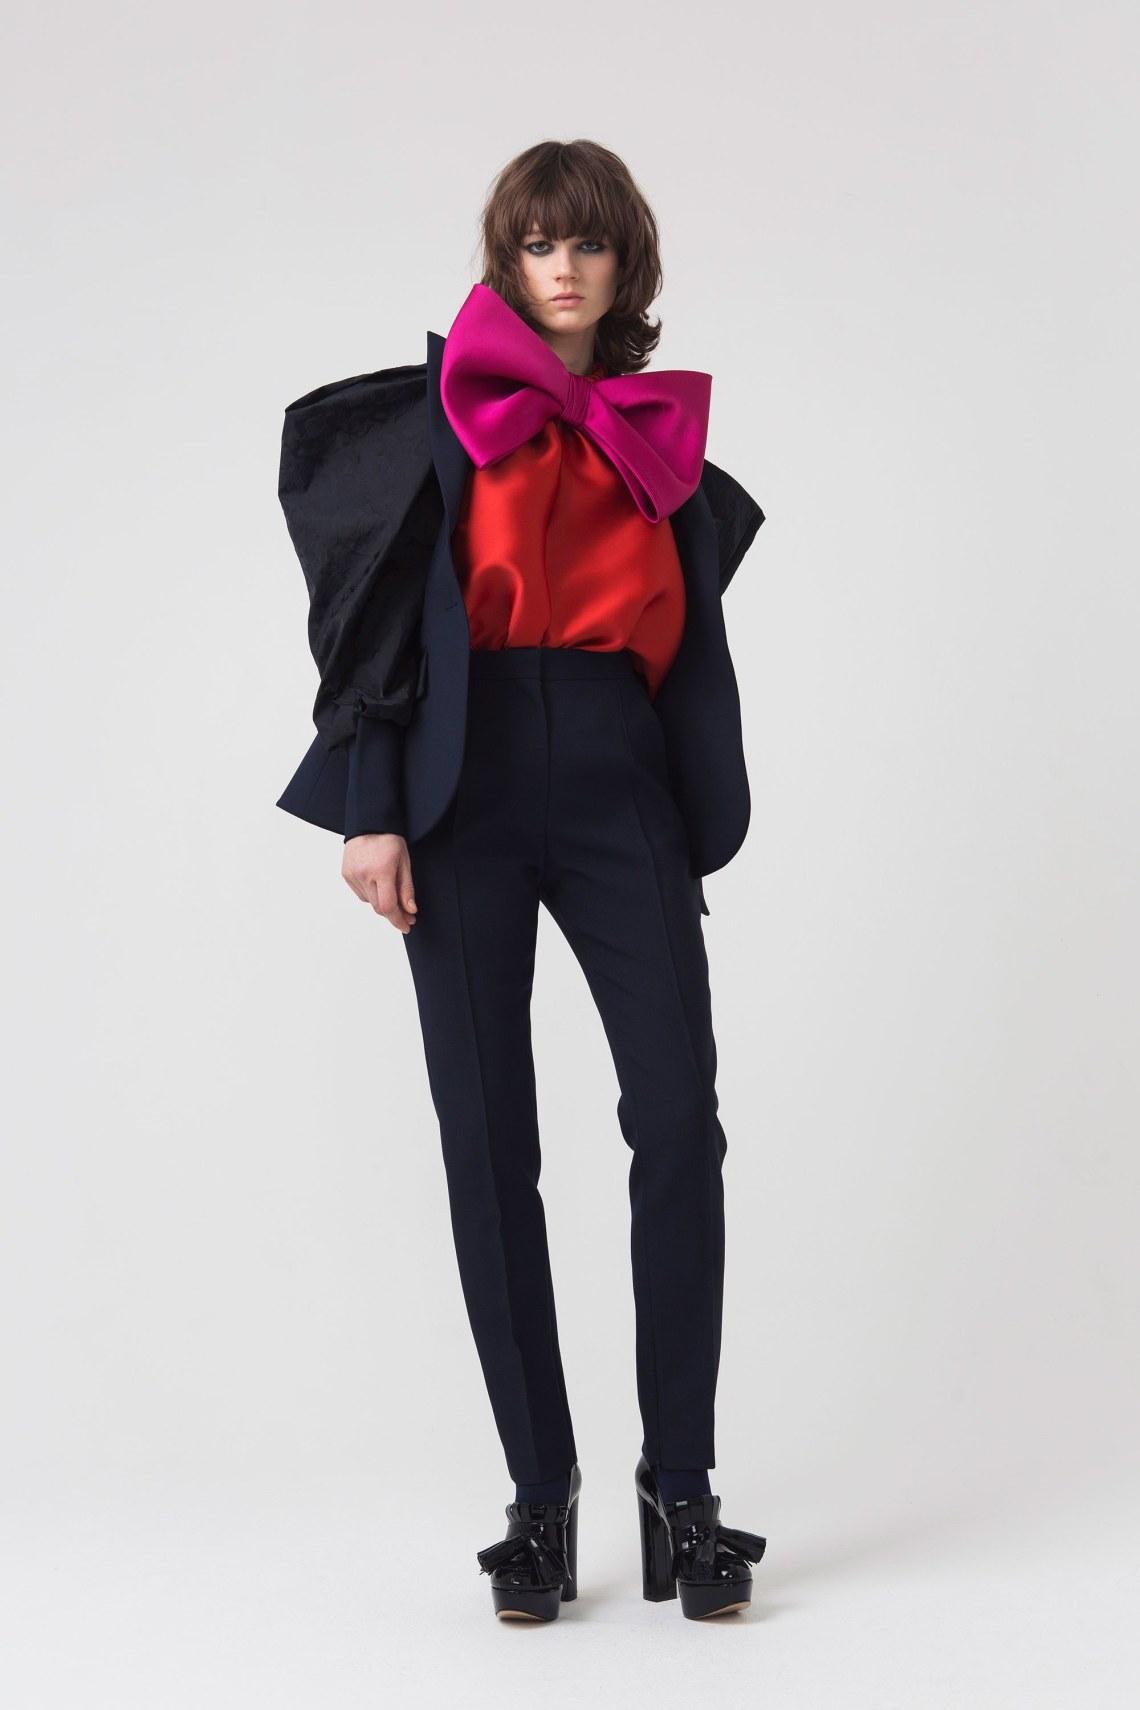 dice-kayek-fall-2018-how-to-wear-oversized-jacket.jpg